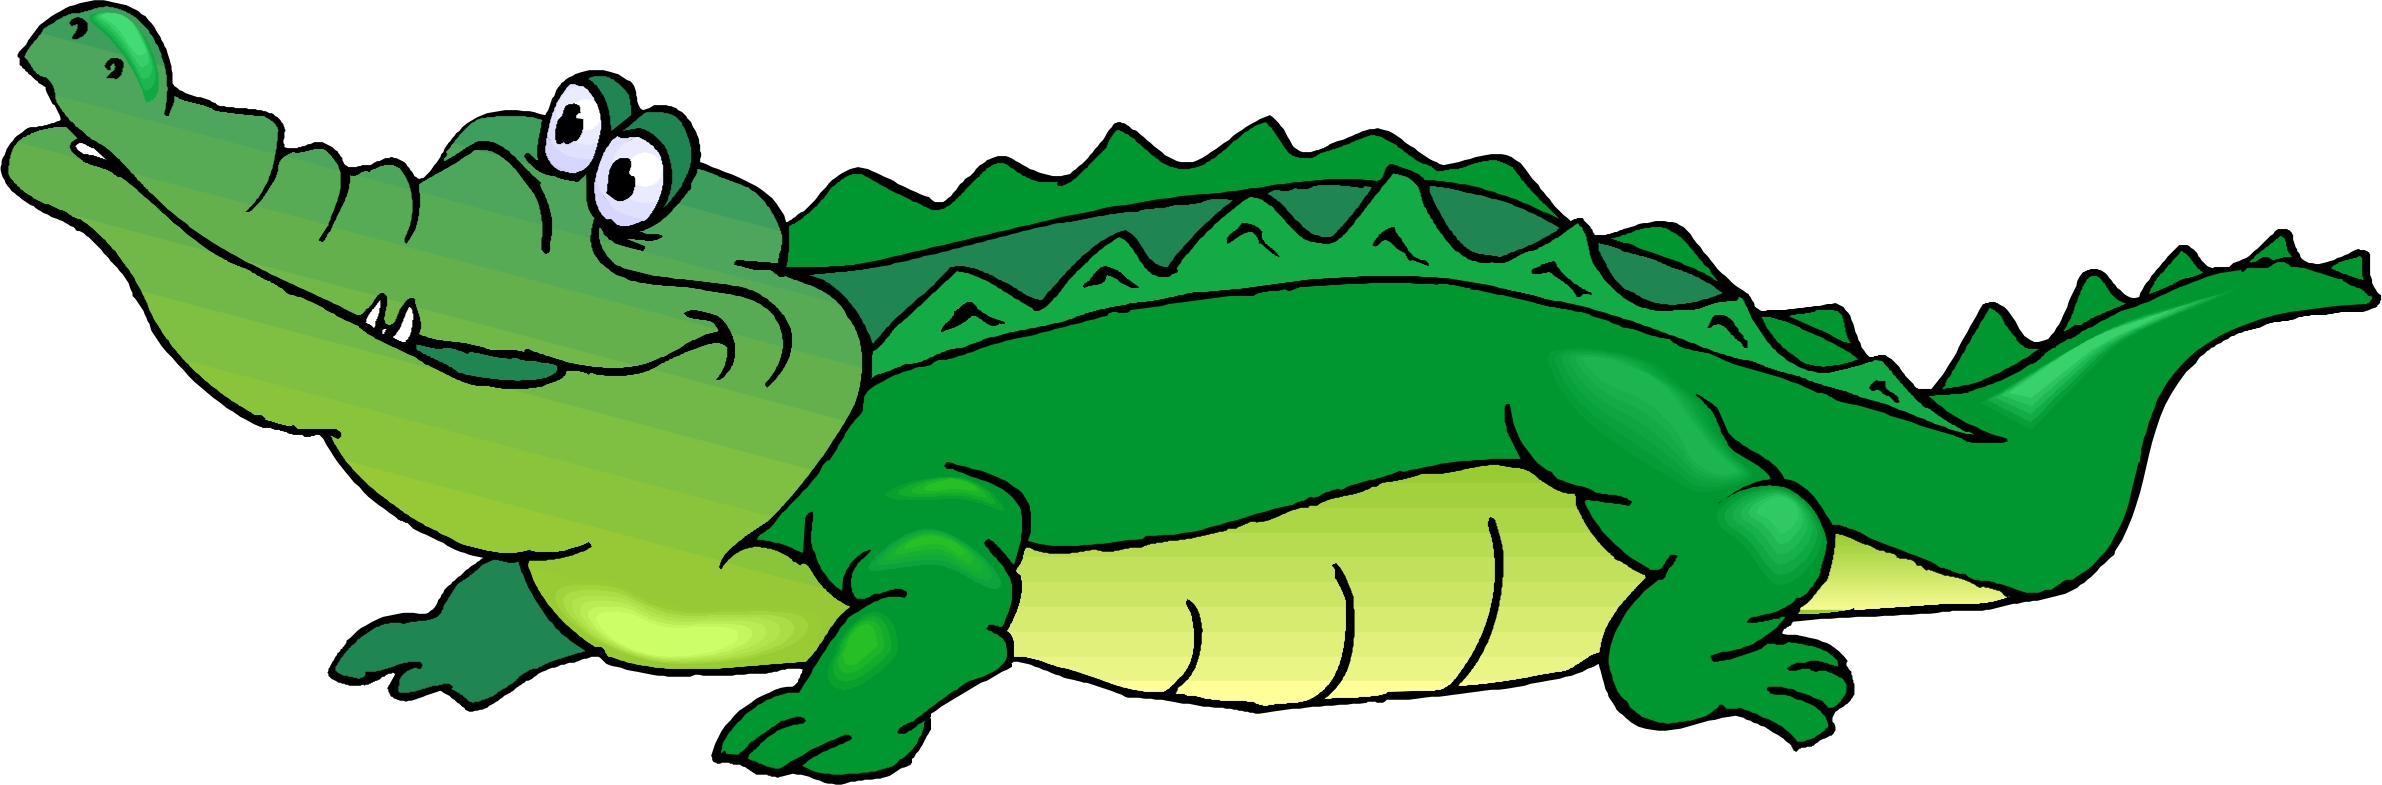 Crocodile clipart free clipart library stock Free Crocodile Cliparts, Download Free Clip Art, Free Clip Art on ... clipart library stock